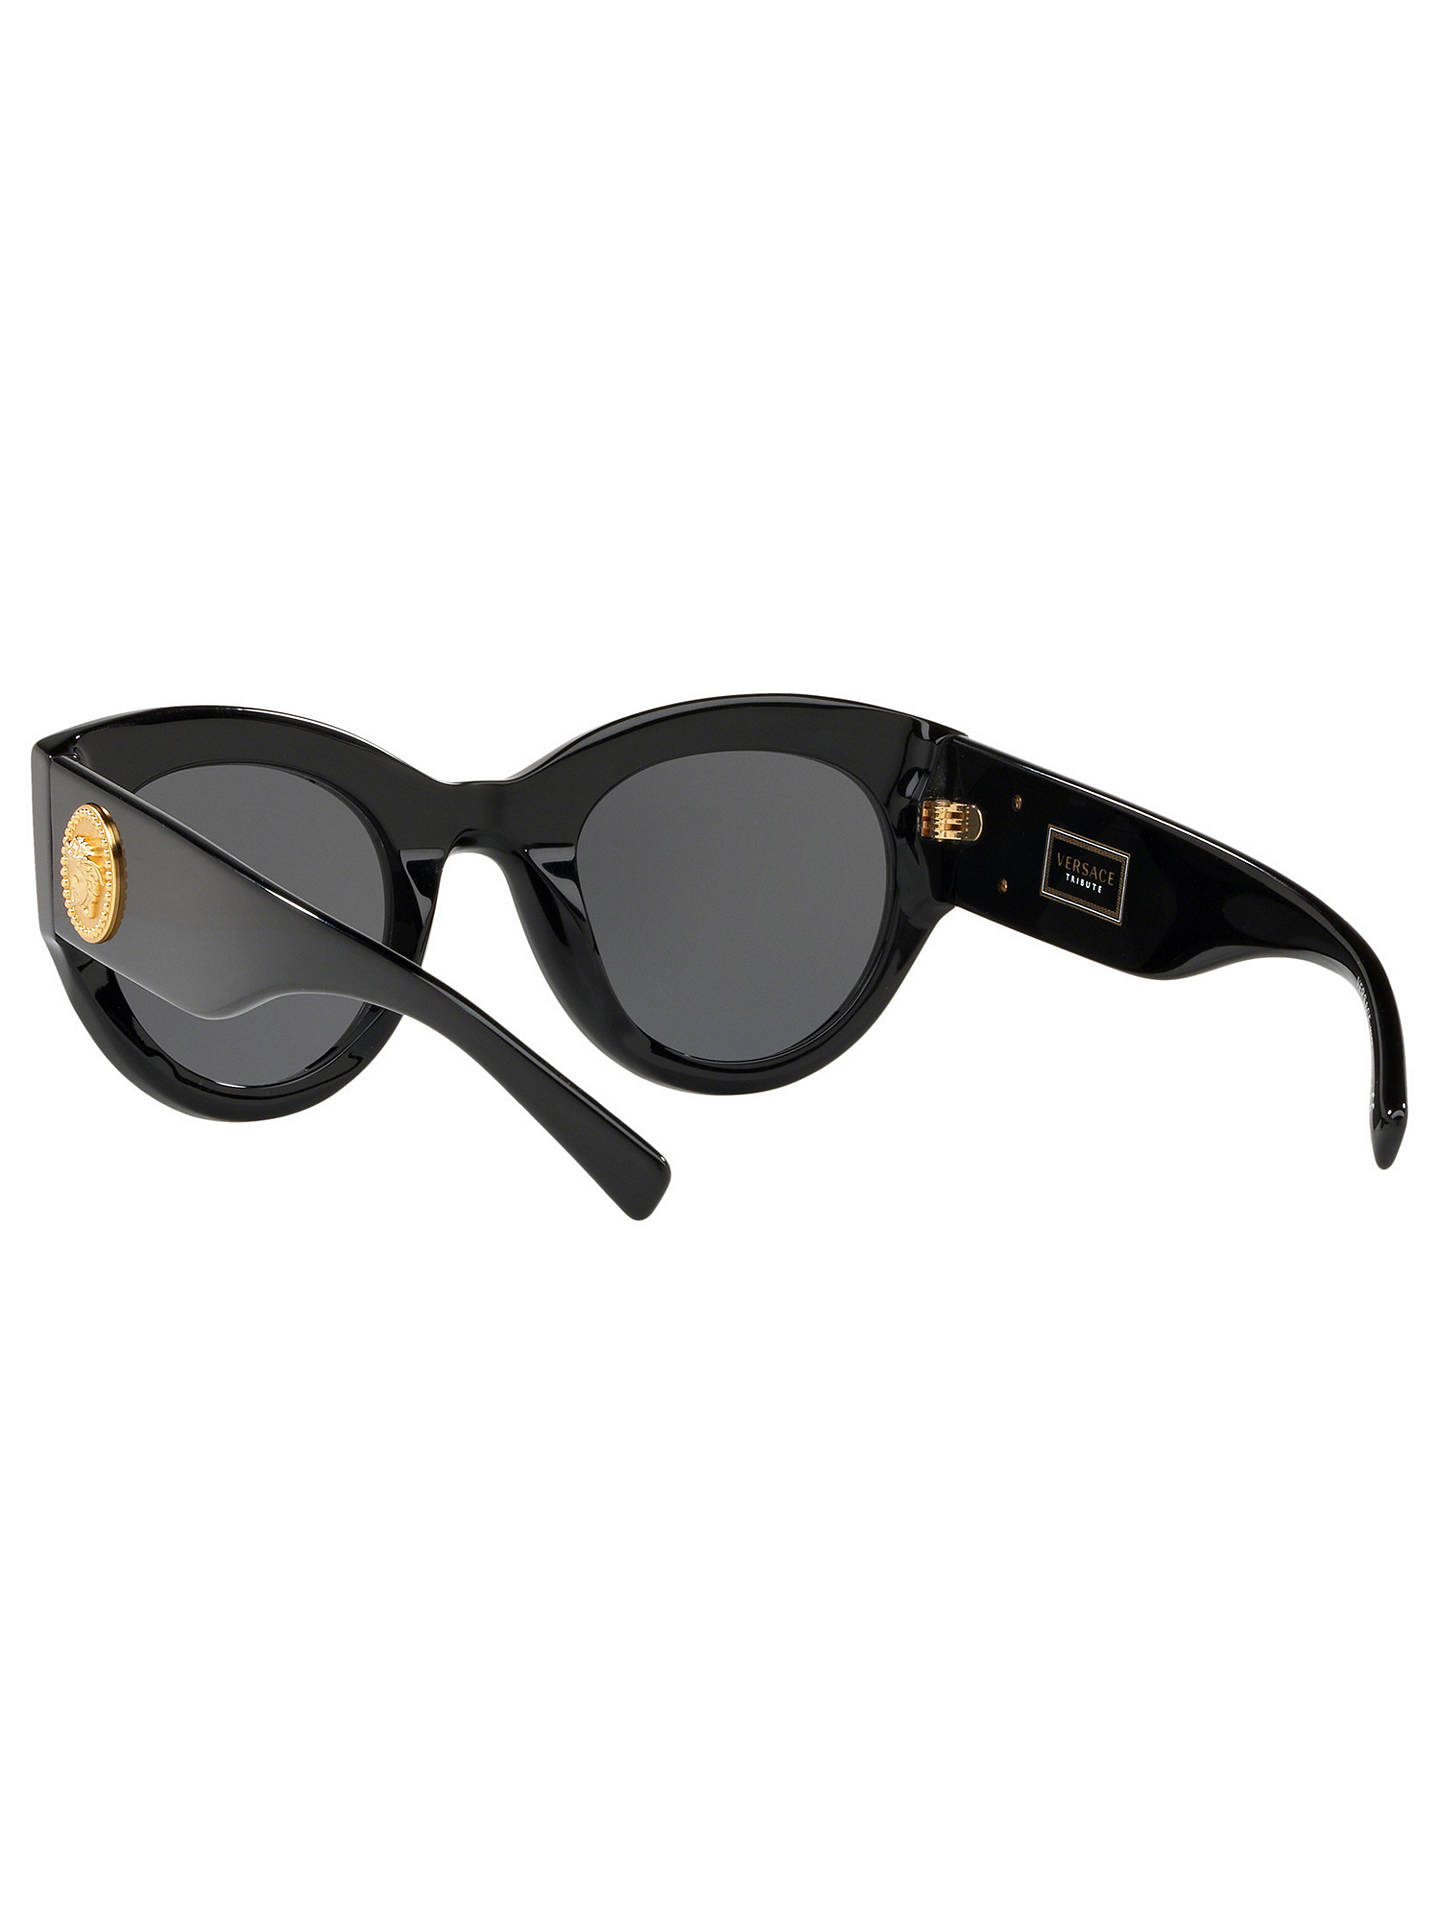 f5d9098ec2 Versace VE4353 Women s Cat s Eye Sunglasses at John Lewis   Partners